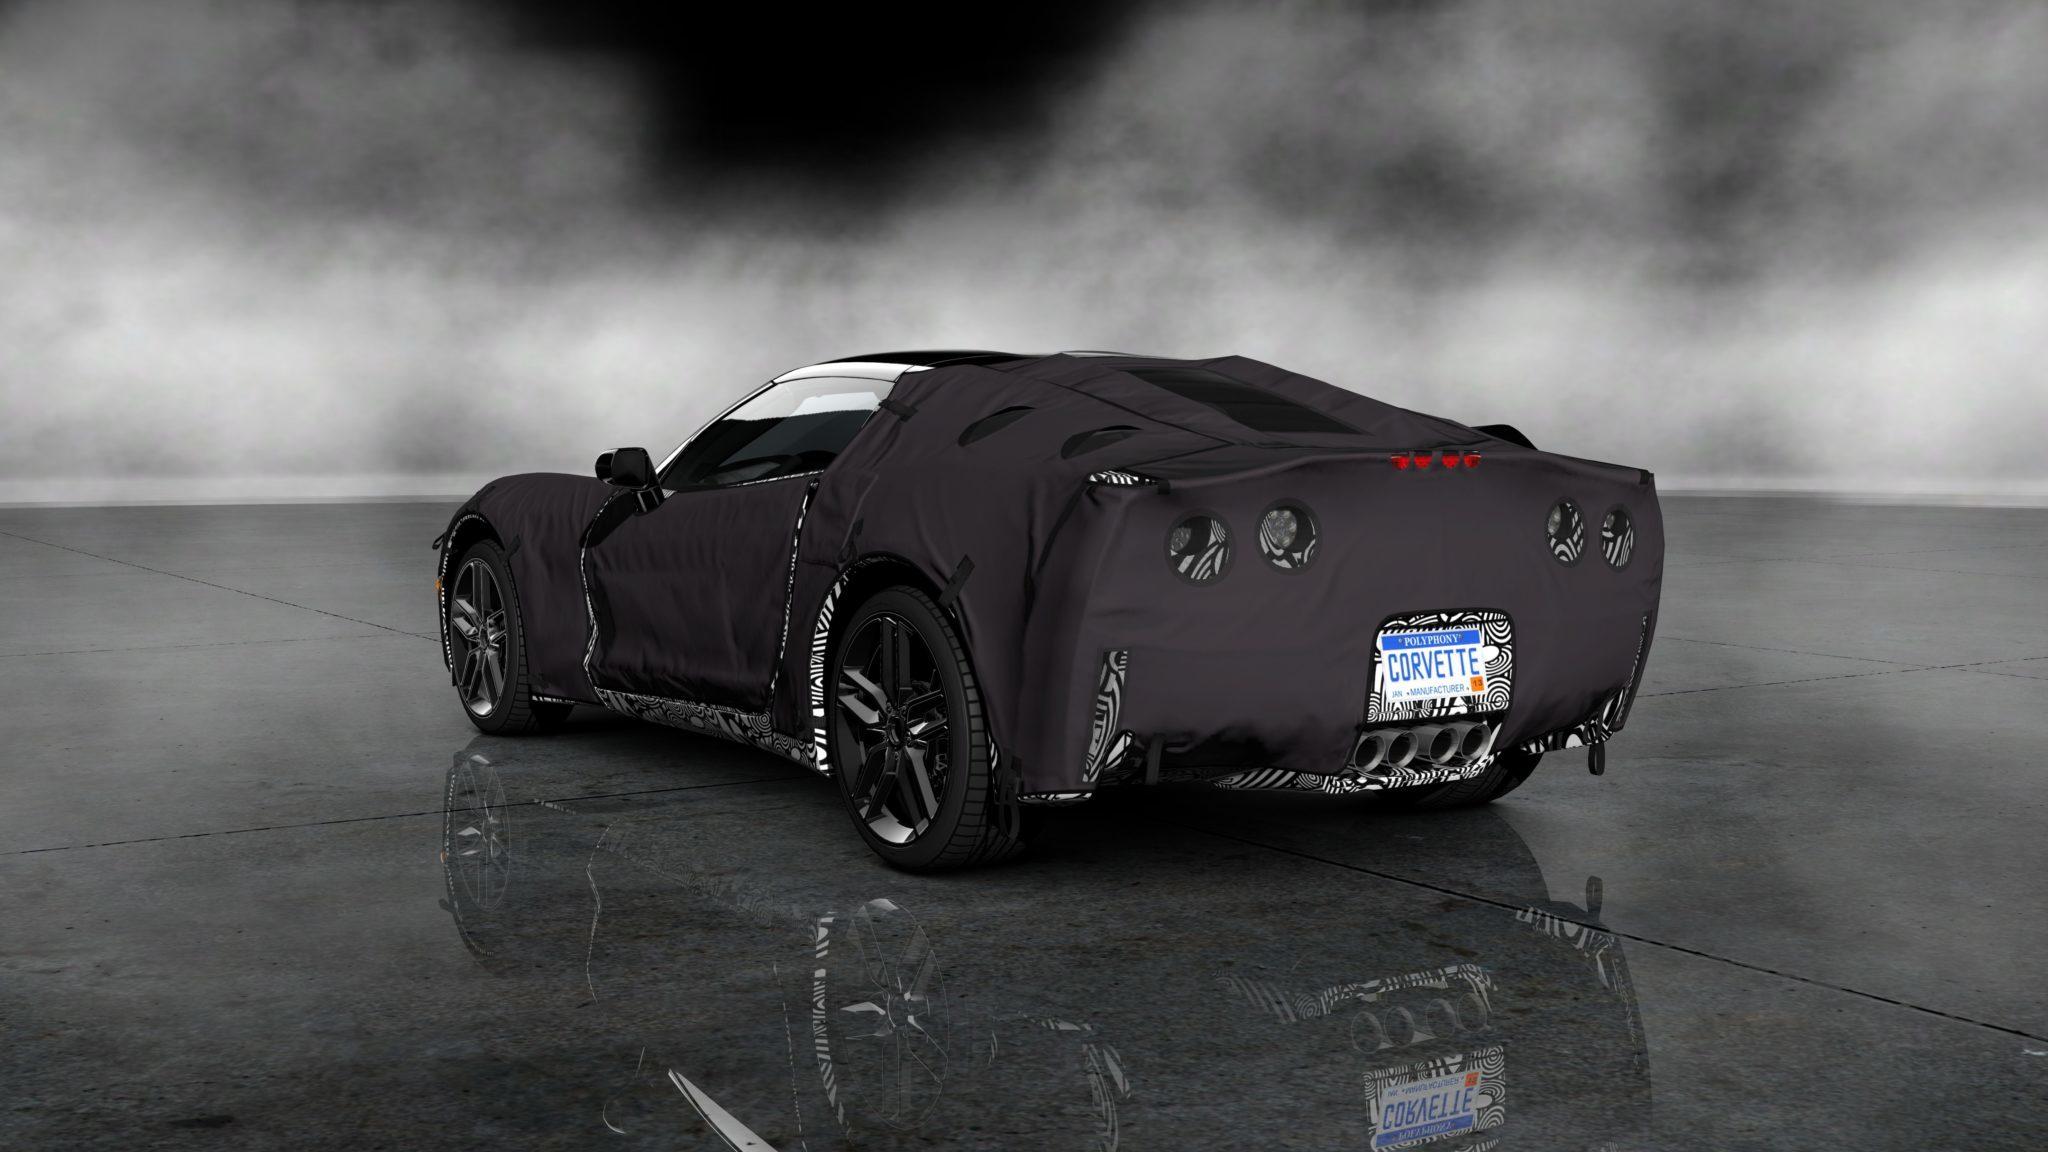 Corvette C7 Prototype in Gran Turismo 5 as Free DLC Today